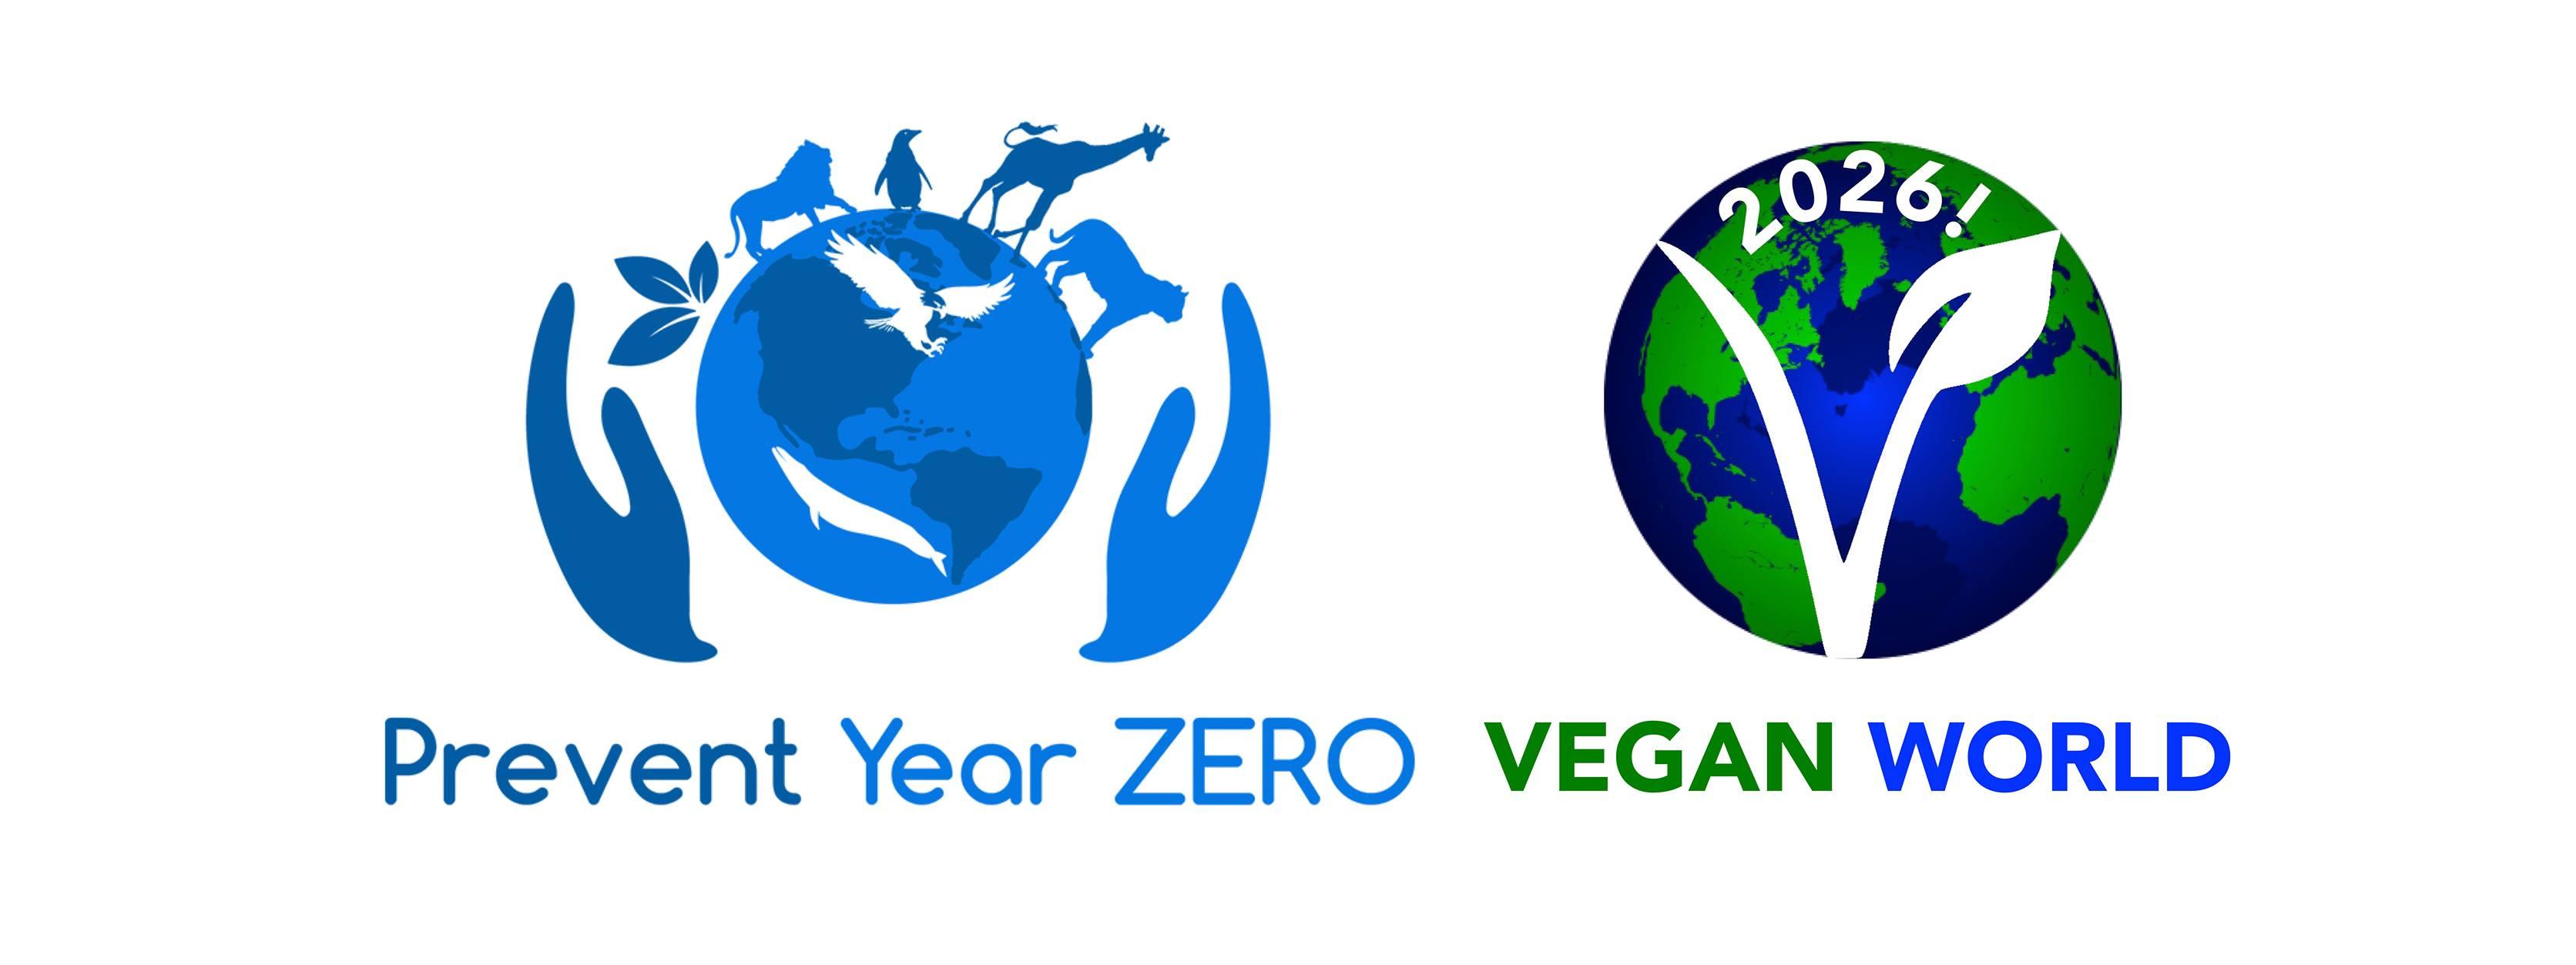 Vegan World 2026